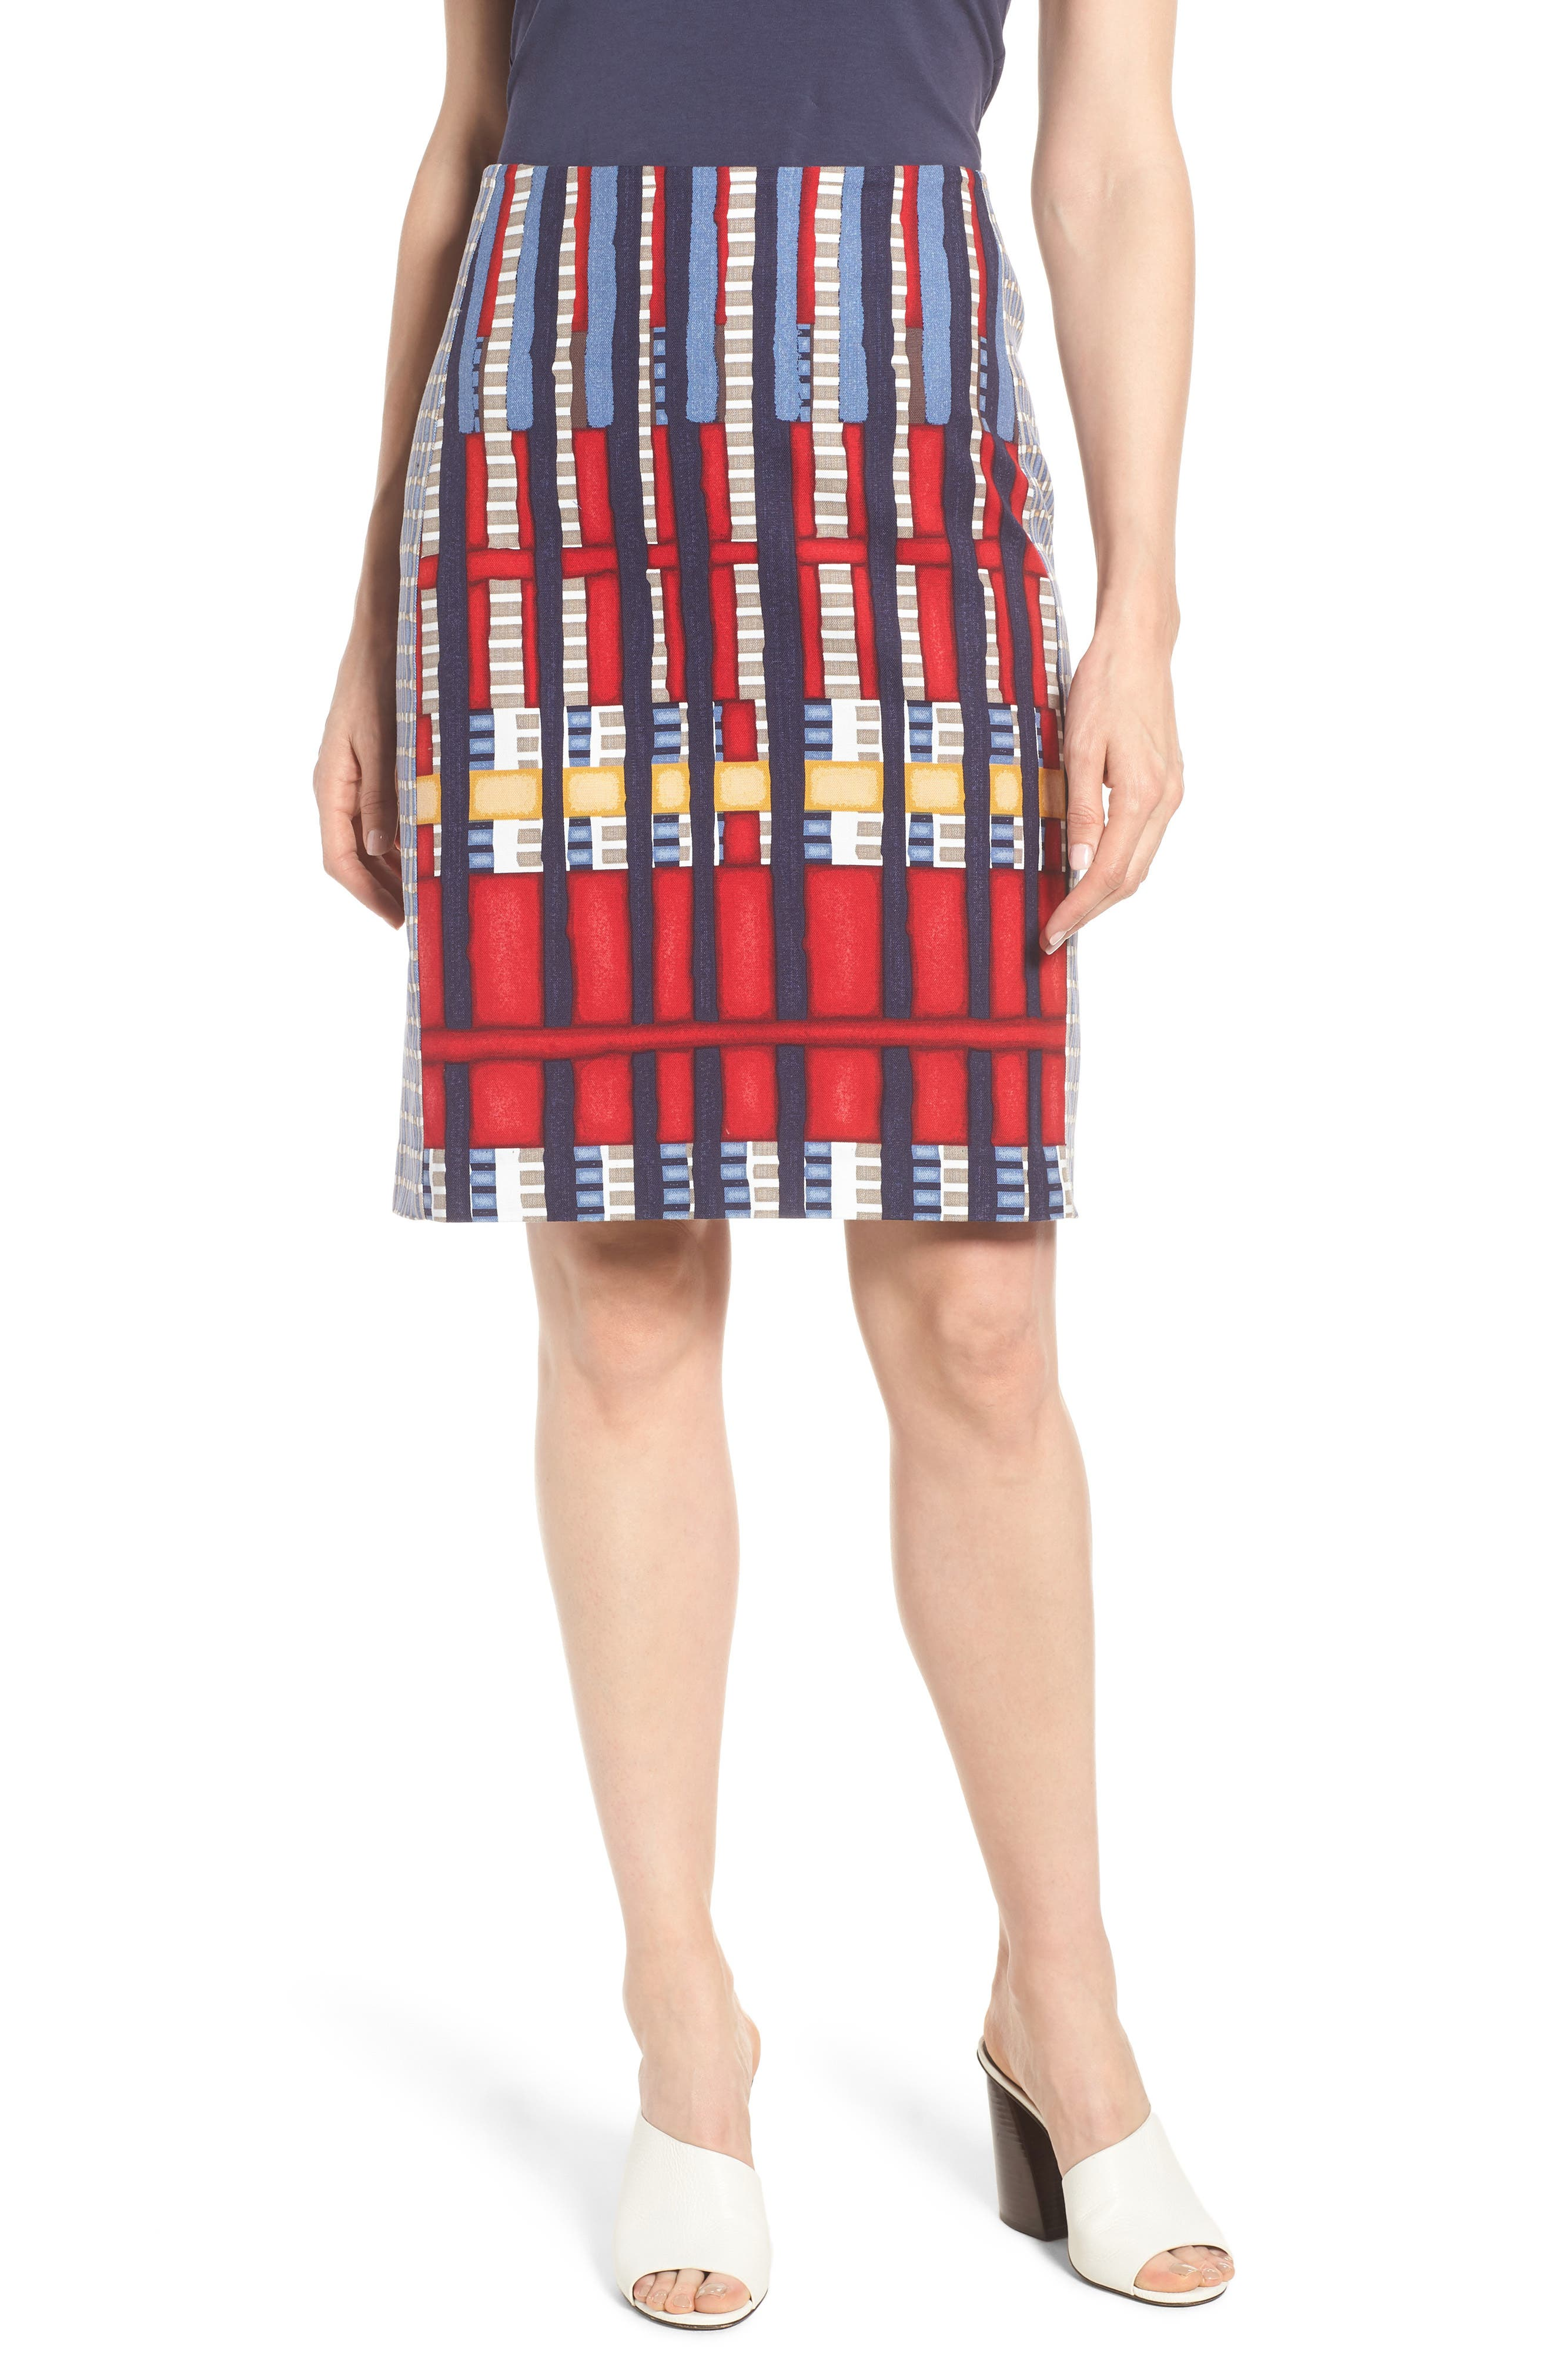 Santiago Hills Block Skirt,                             Main thumbnail 1, color,                             Multi